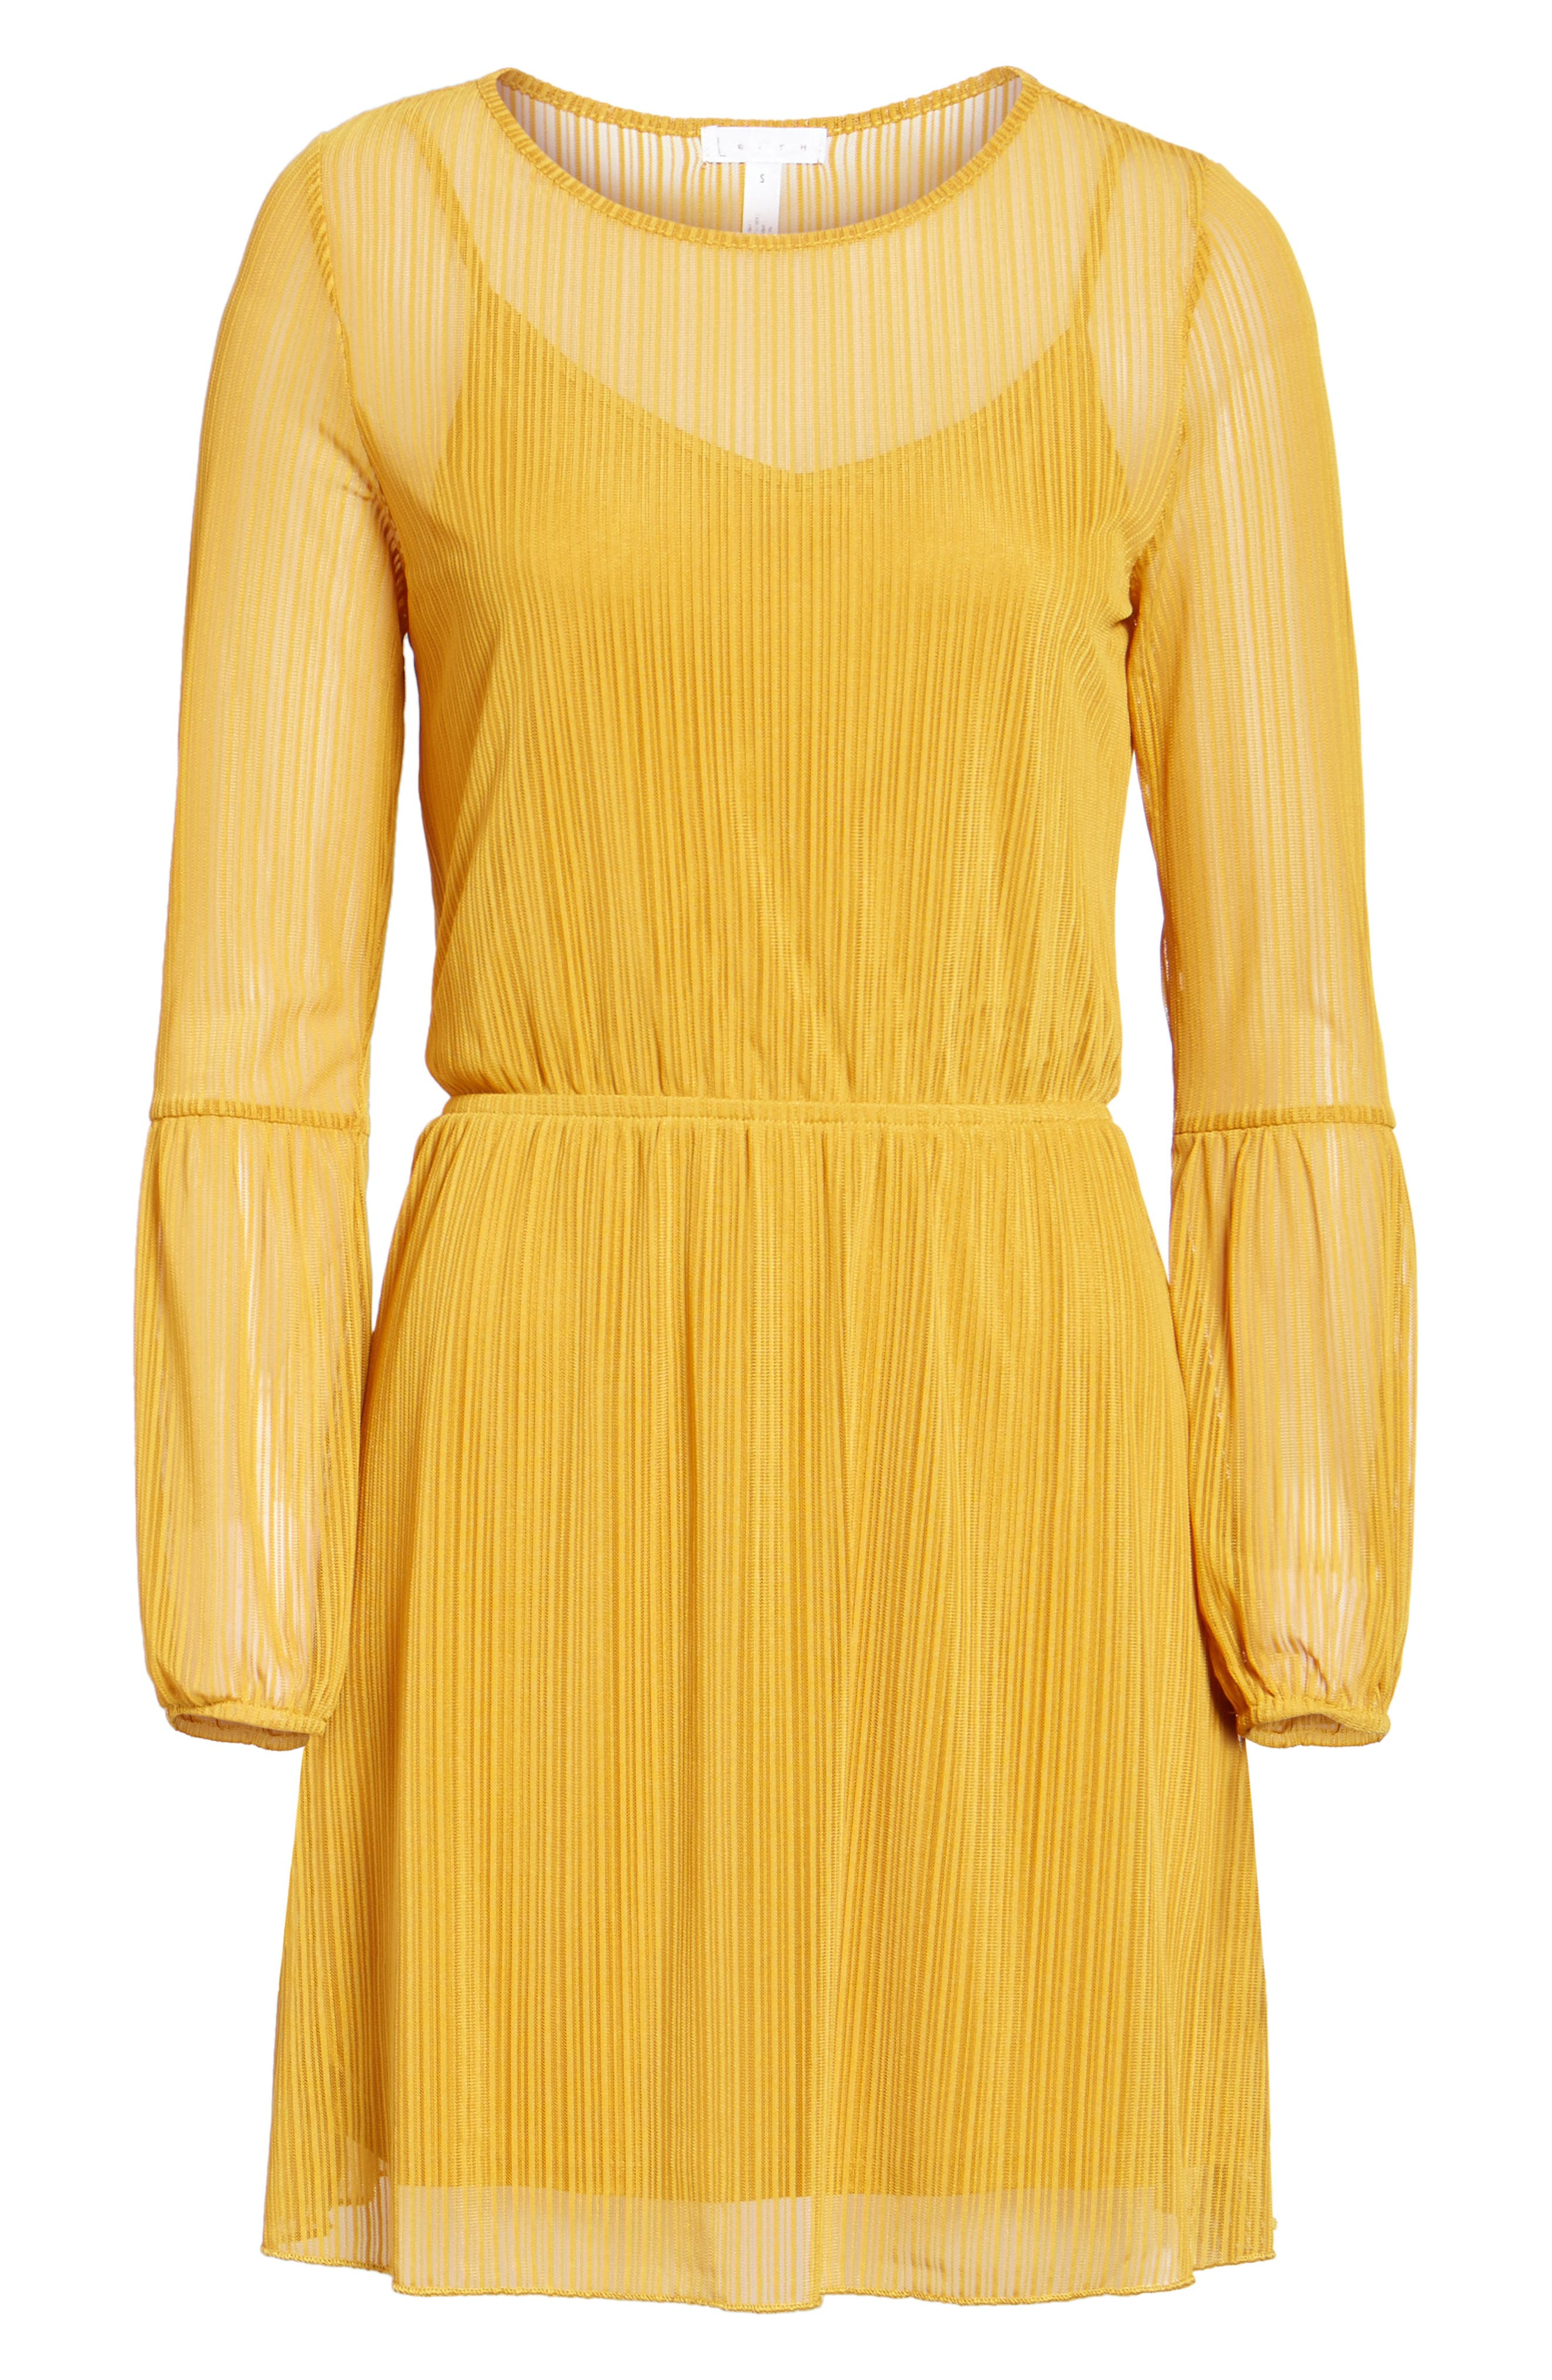 Blouson Dress,                             Alternate thumbnail 6, color,